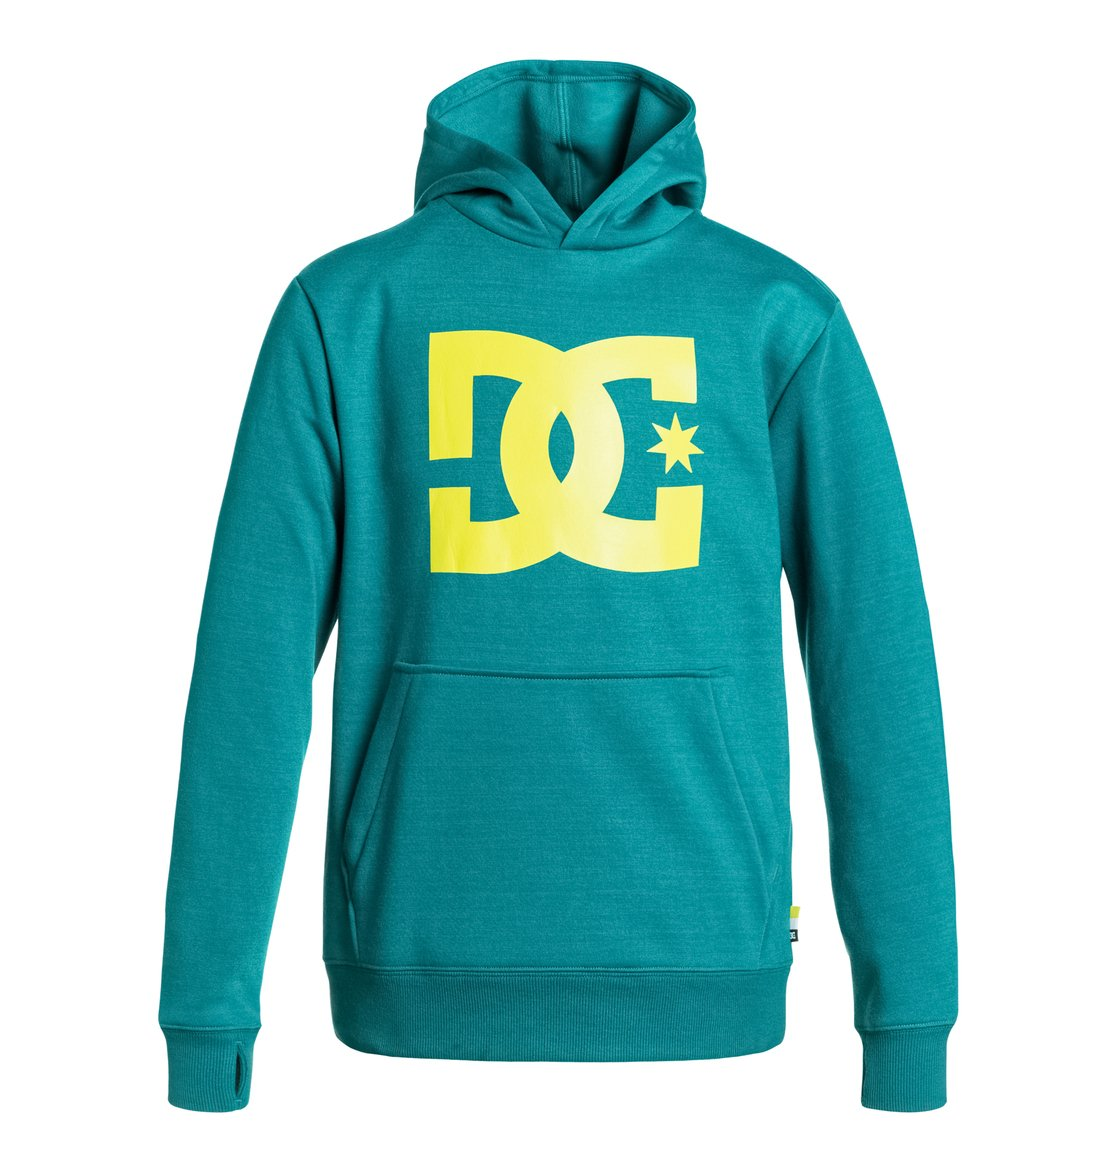 Dc shoes hoodies